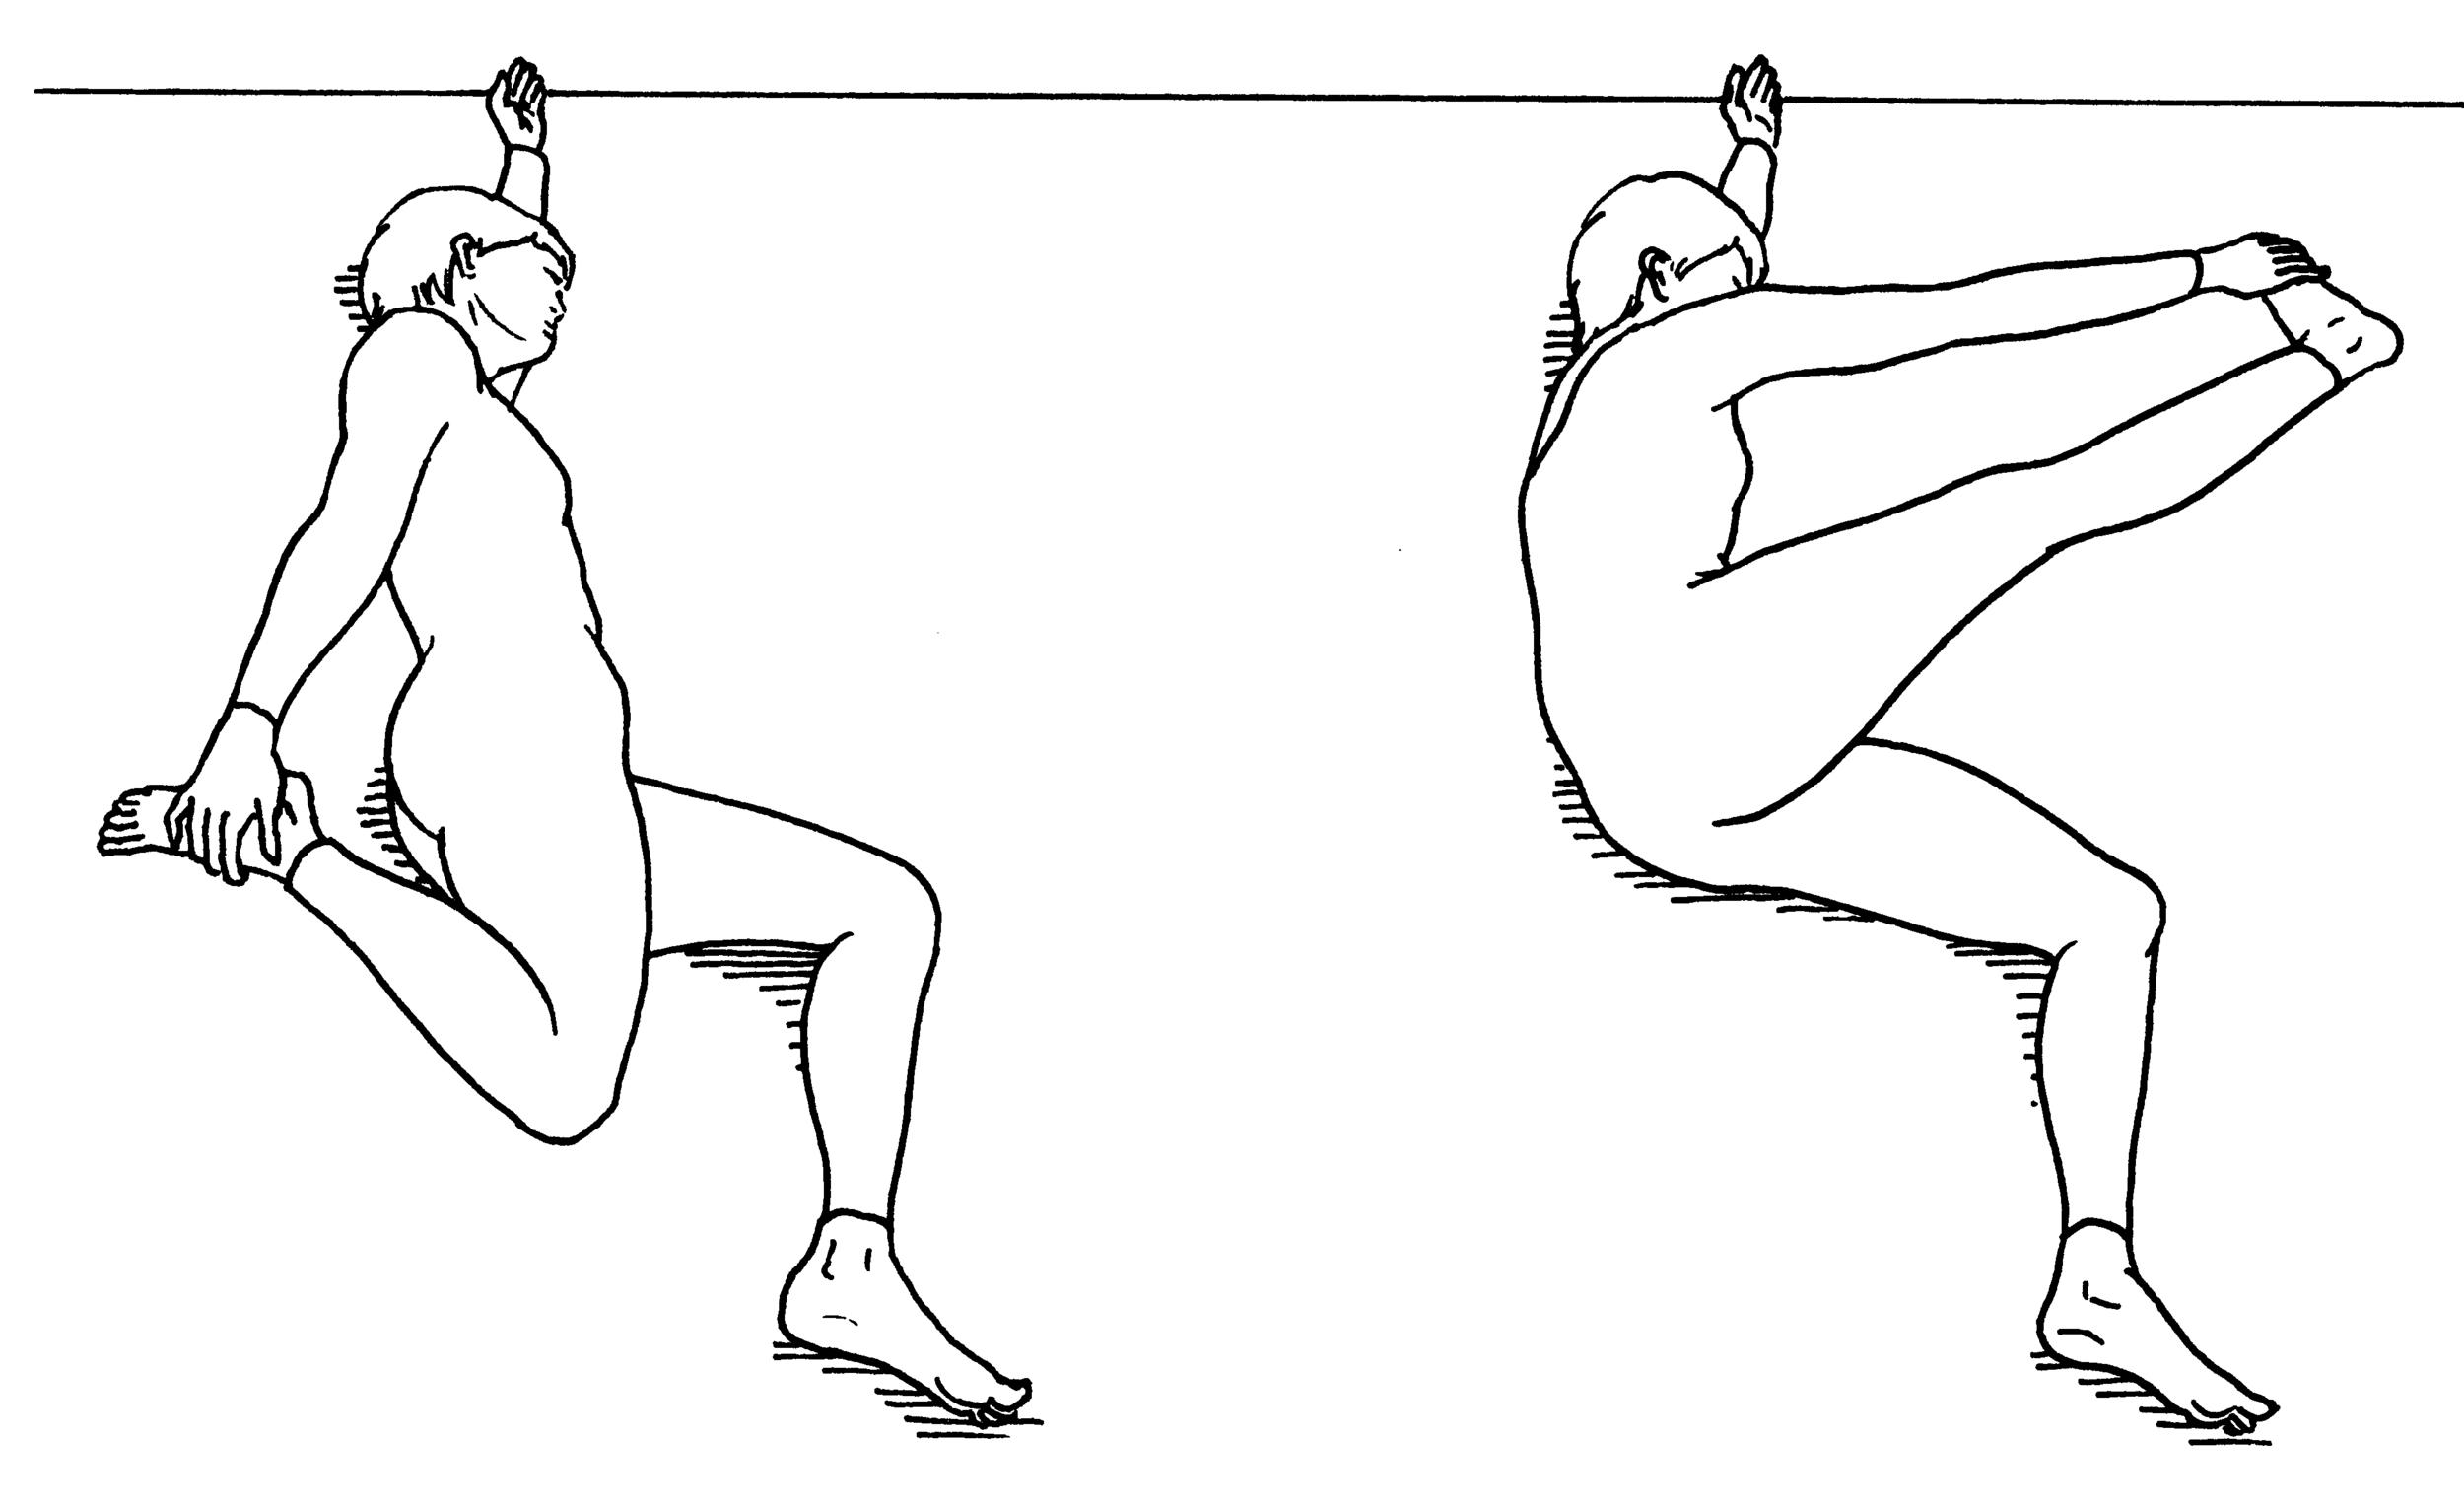 16. hamstrings and quads a&b.jpg